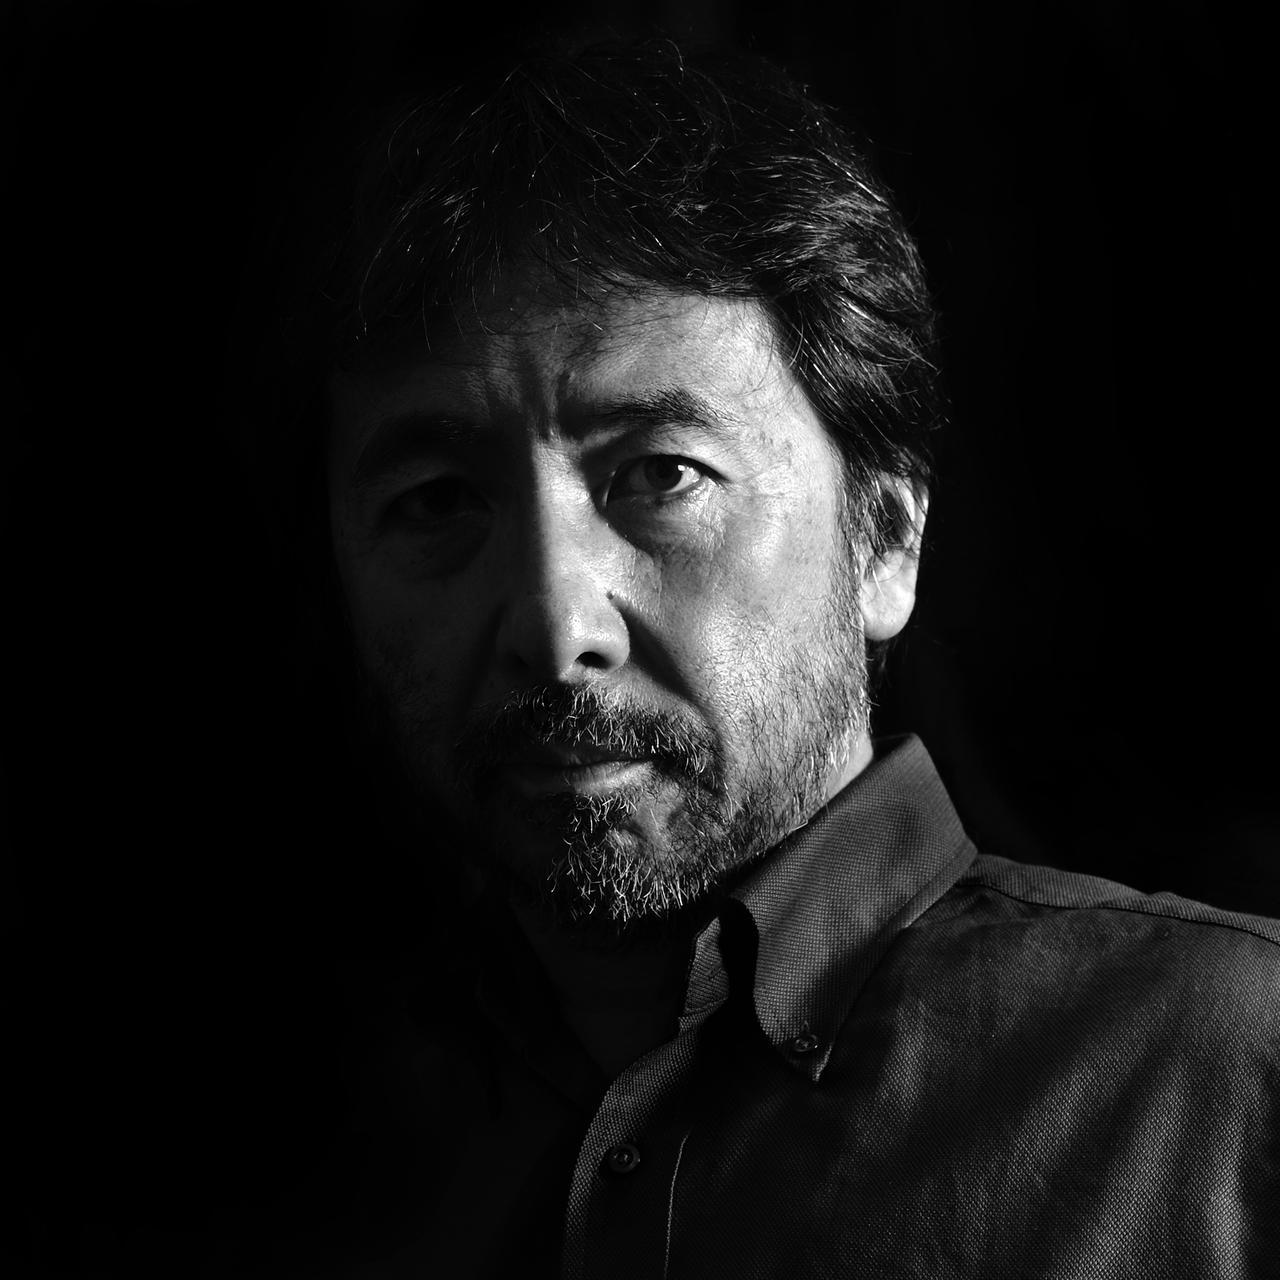 画像: 小林稔 Minoru Kobayashi